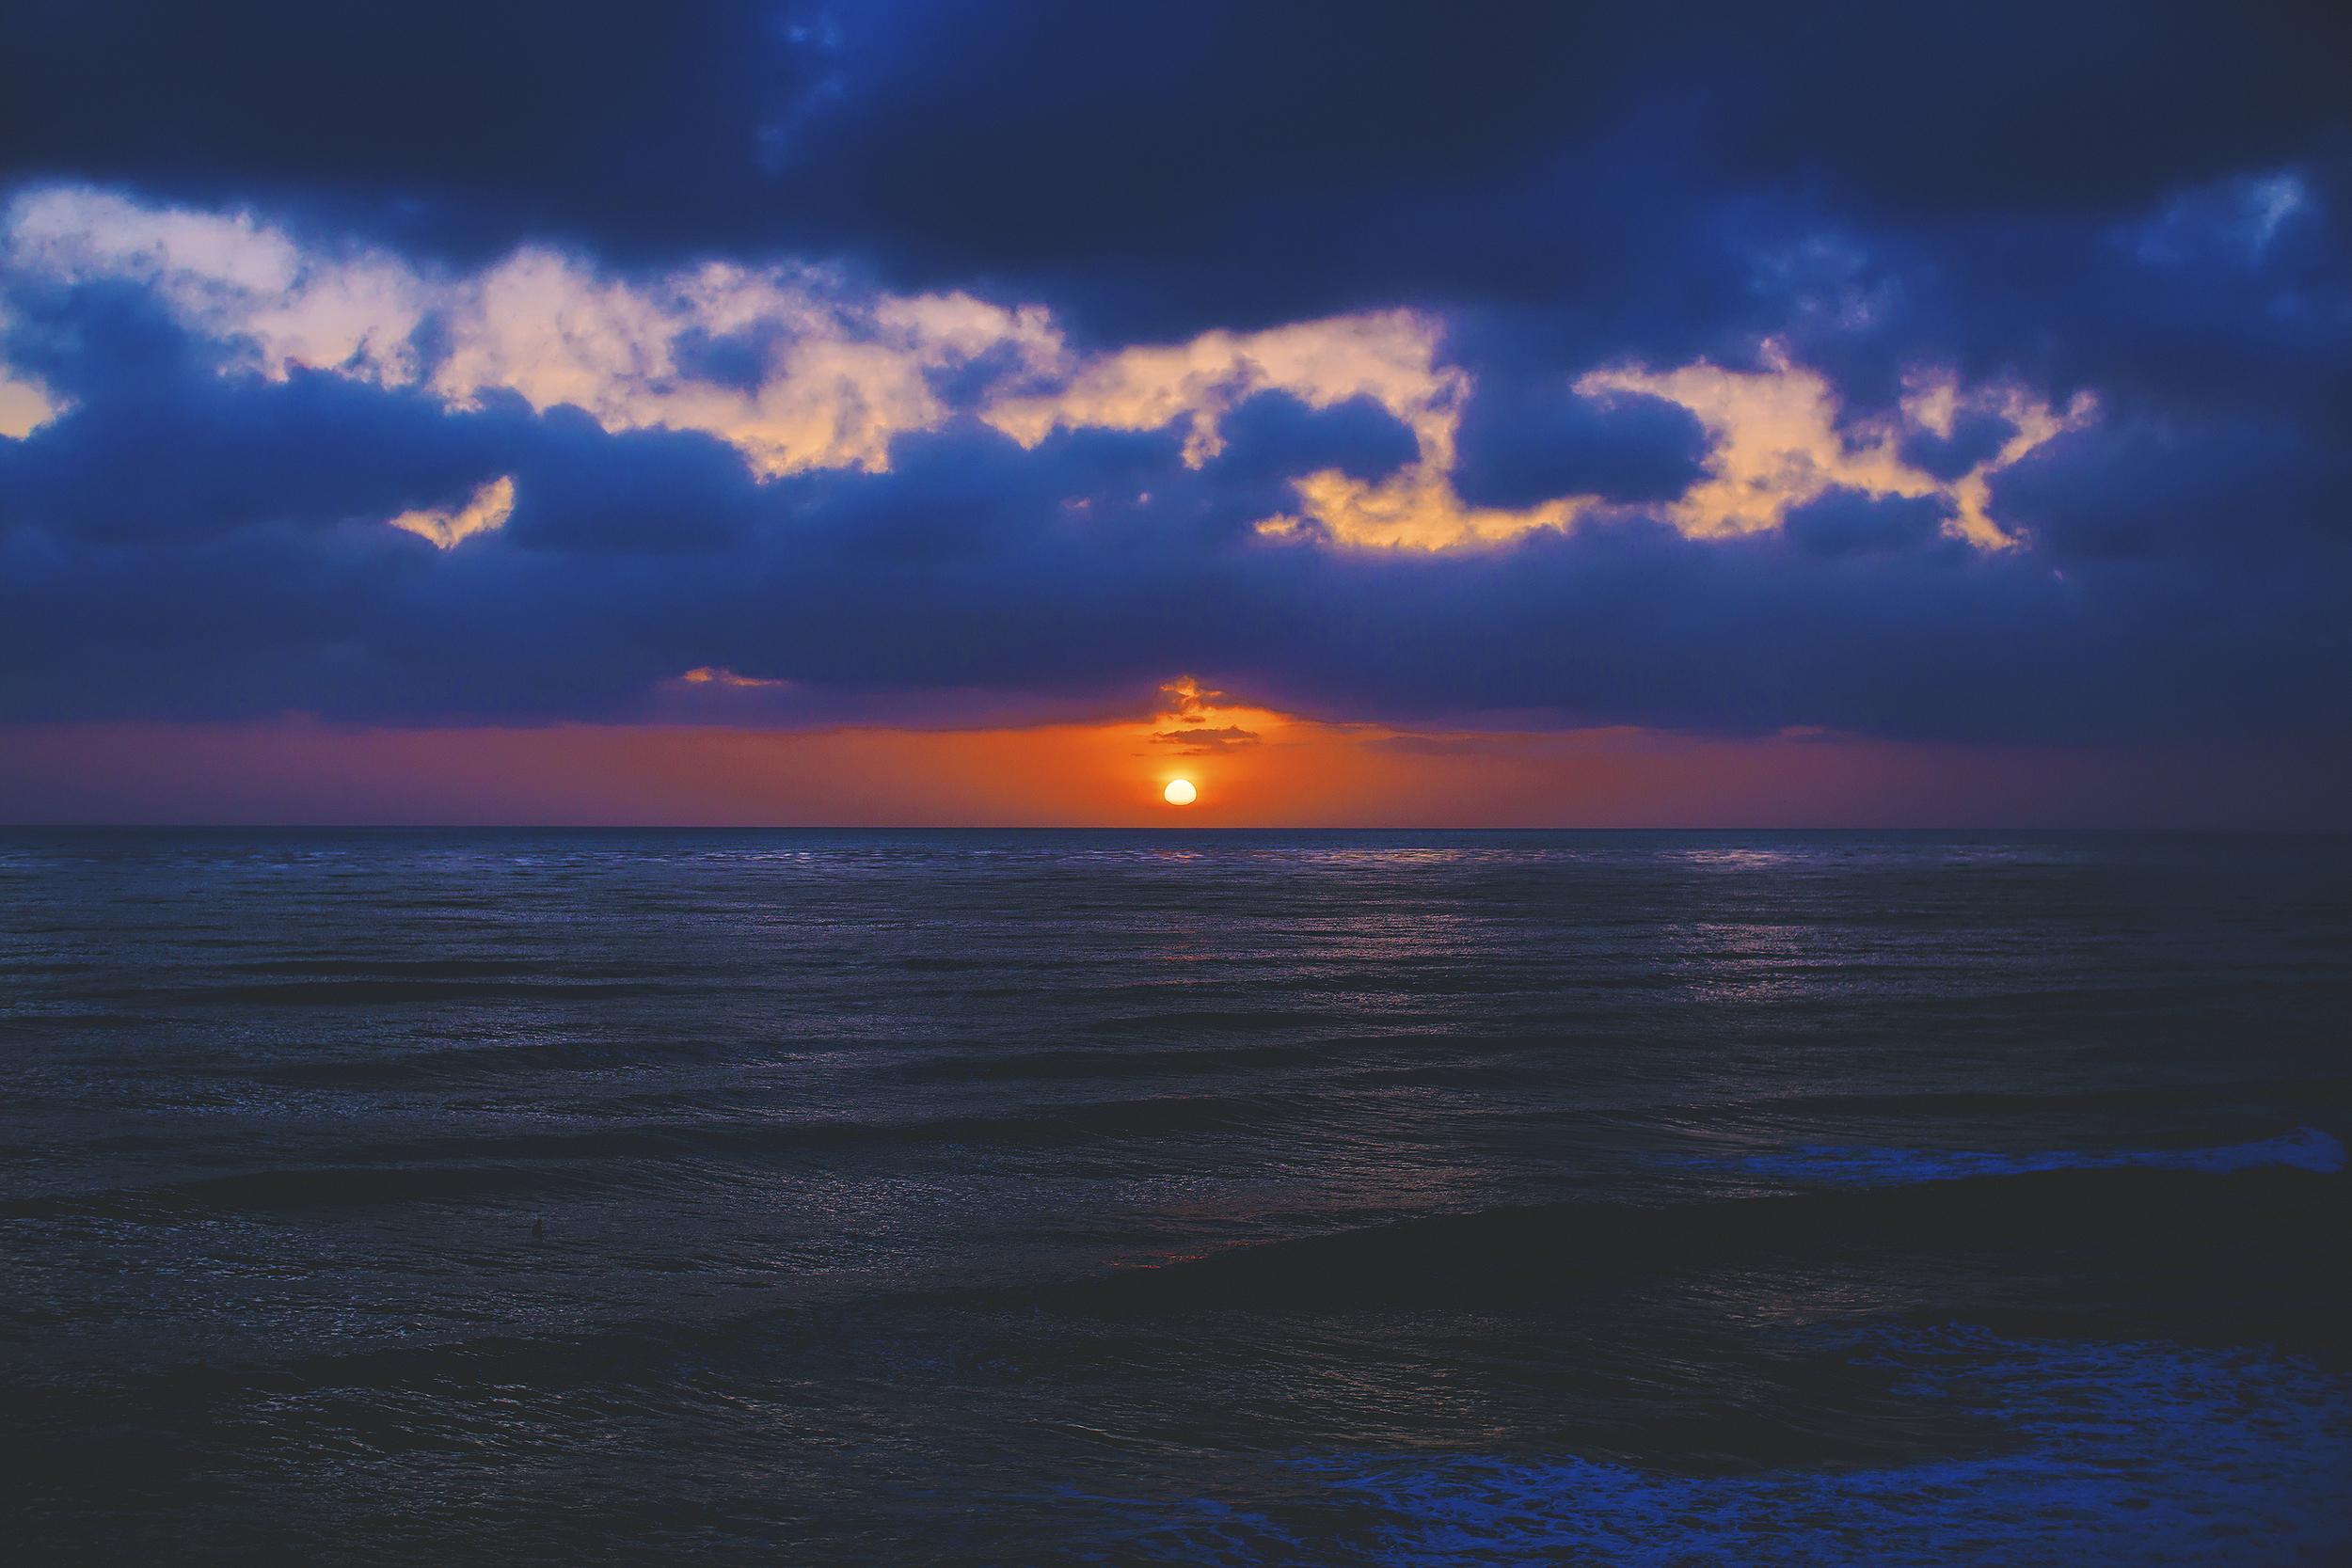 JLRoyal_SanDiego_SunsetCliffsSunset4.jpg